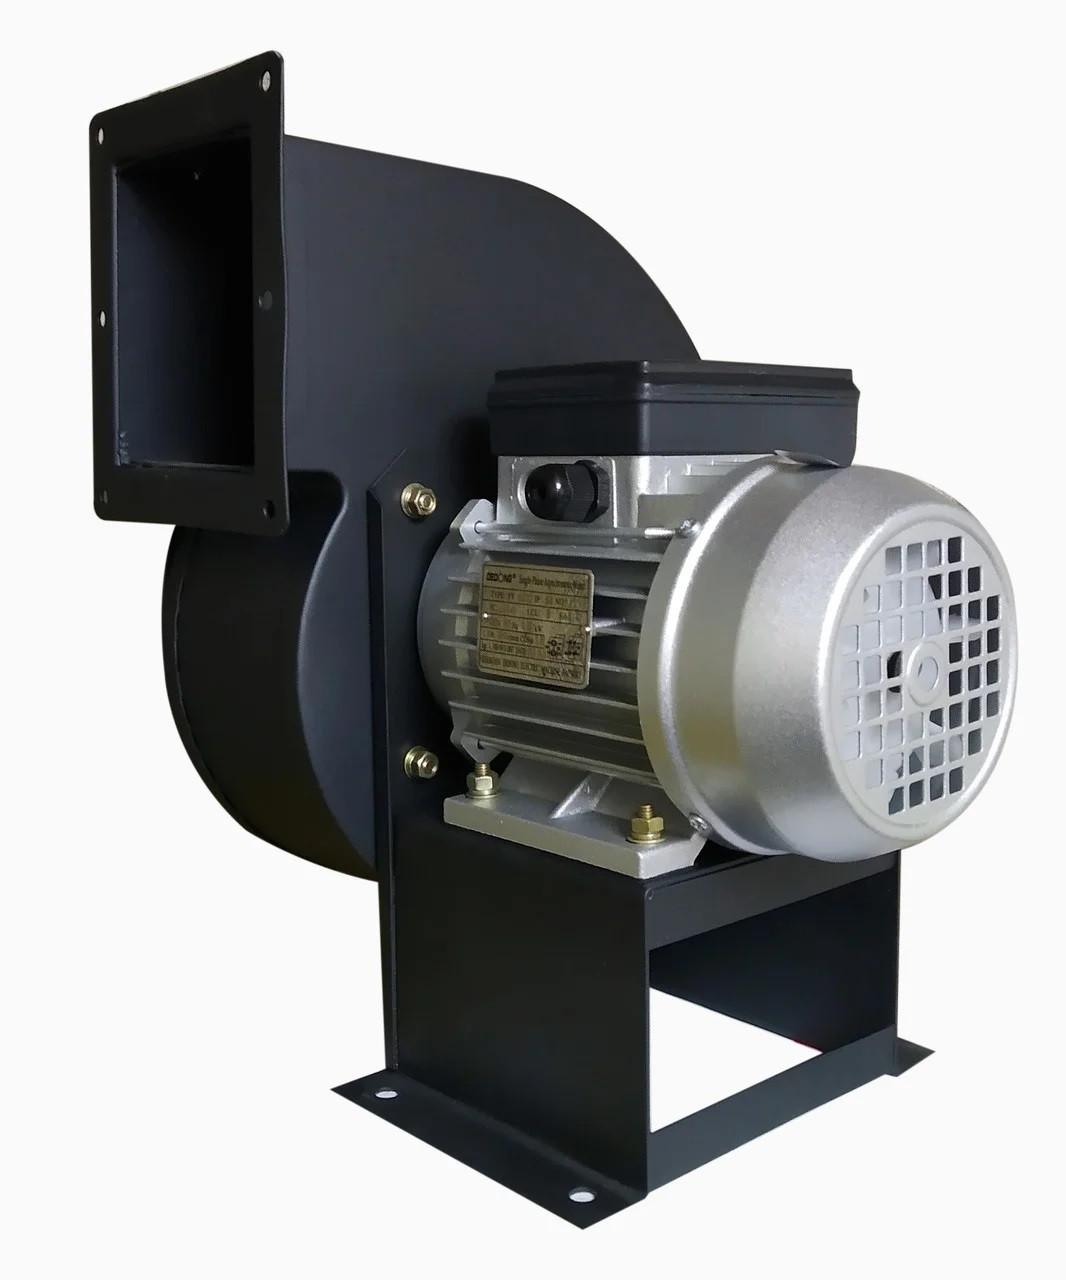 Вентилятор улитка центробежный Turbo DE 190 220В для турбо булерьяна